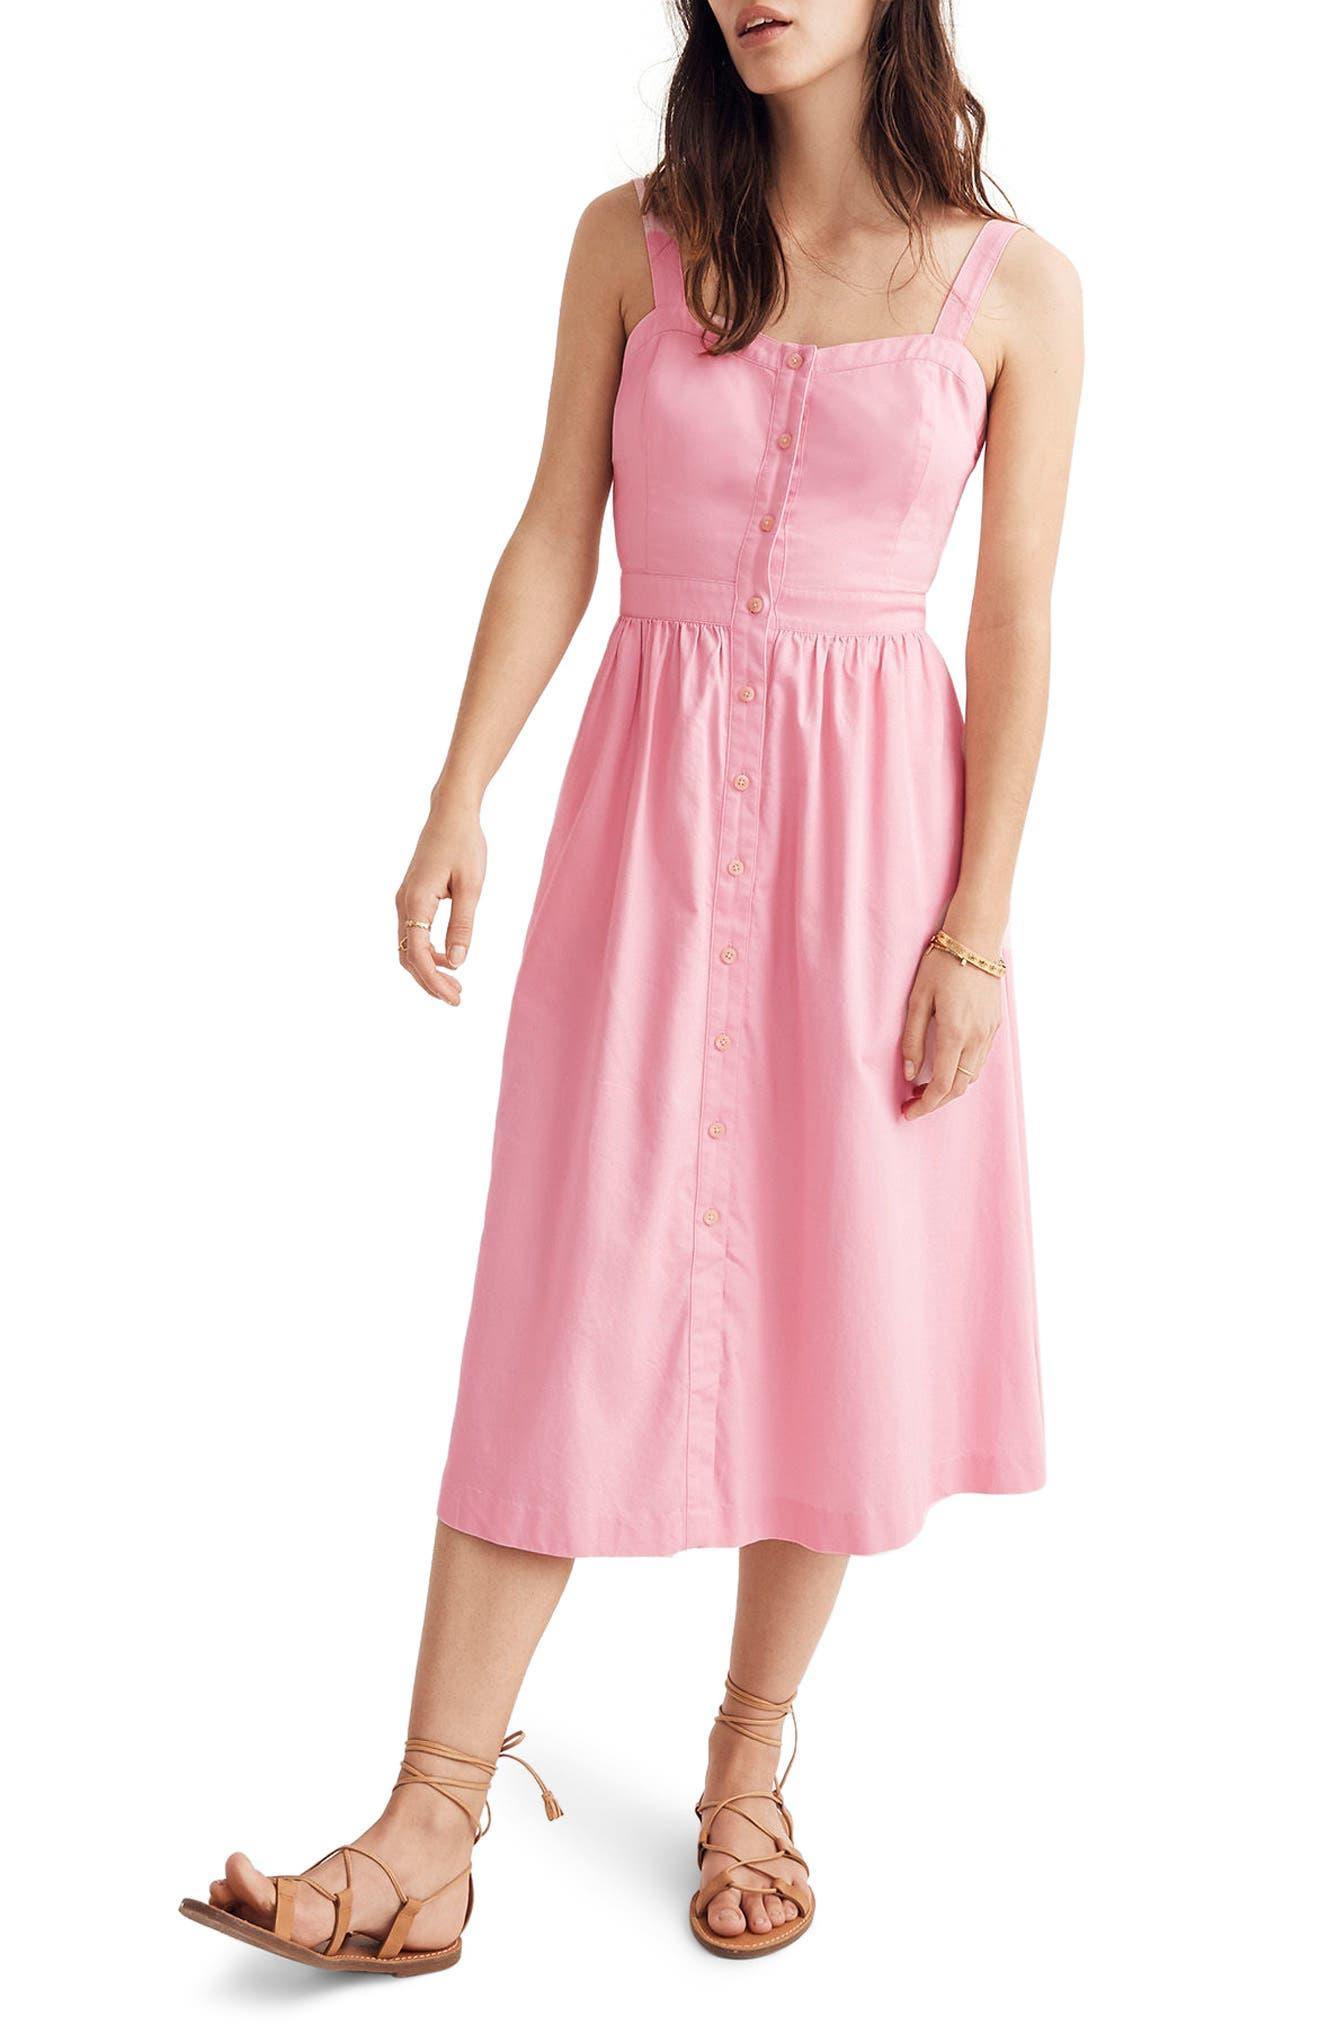 Main Image - Madewell Pink Fleur Bow Back Dress